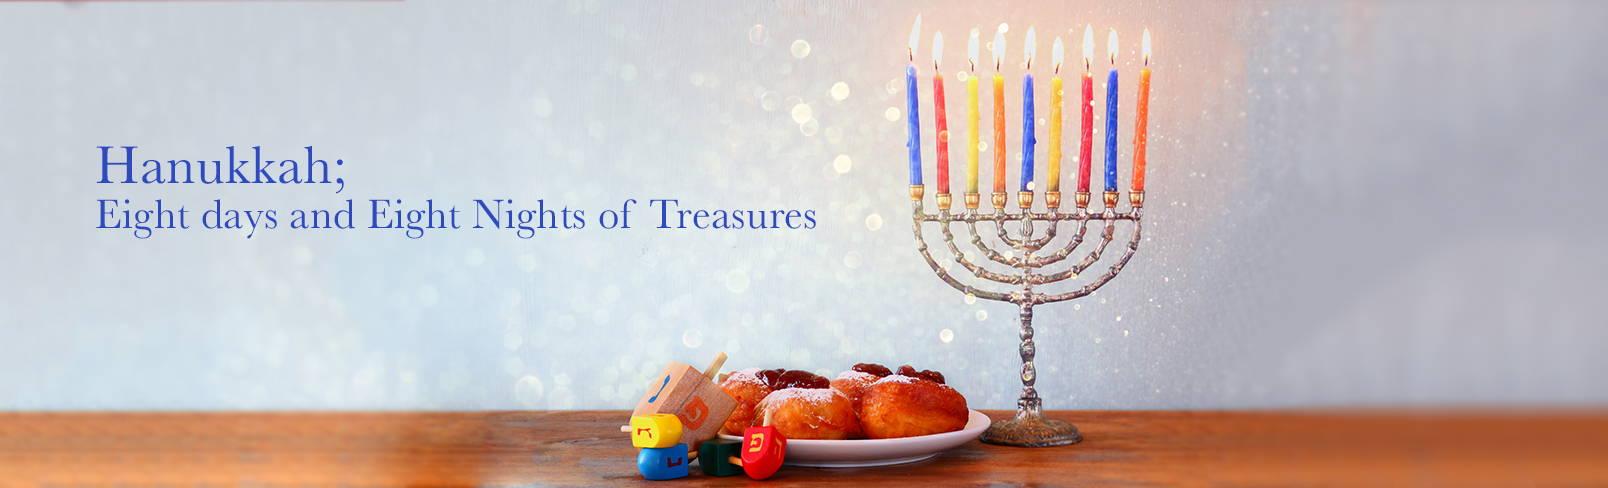 High Quality Organics Express Hanukkah menorah with donuts and dreidel